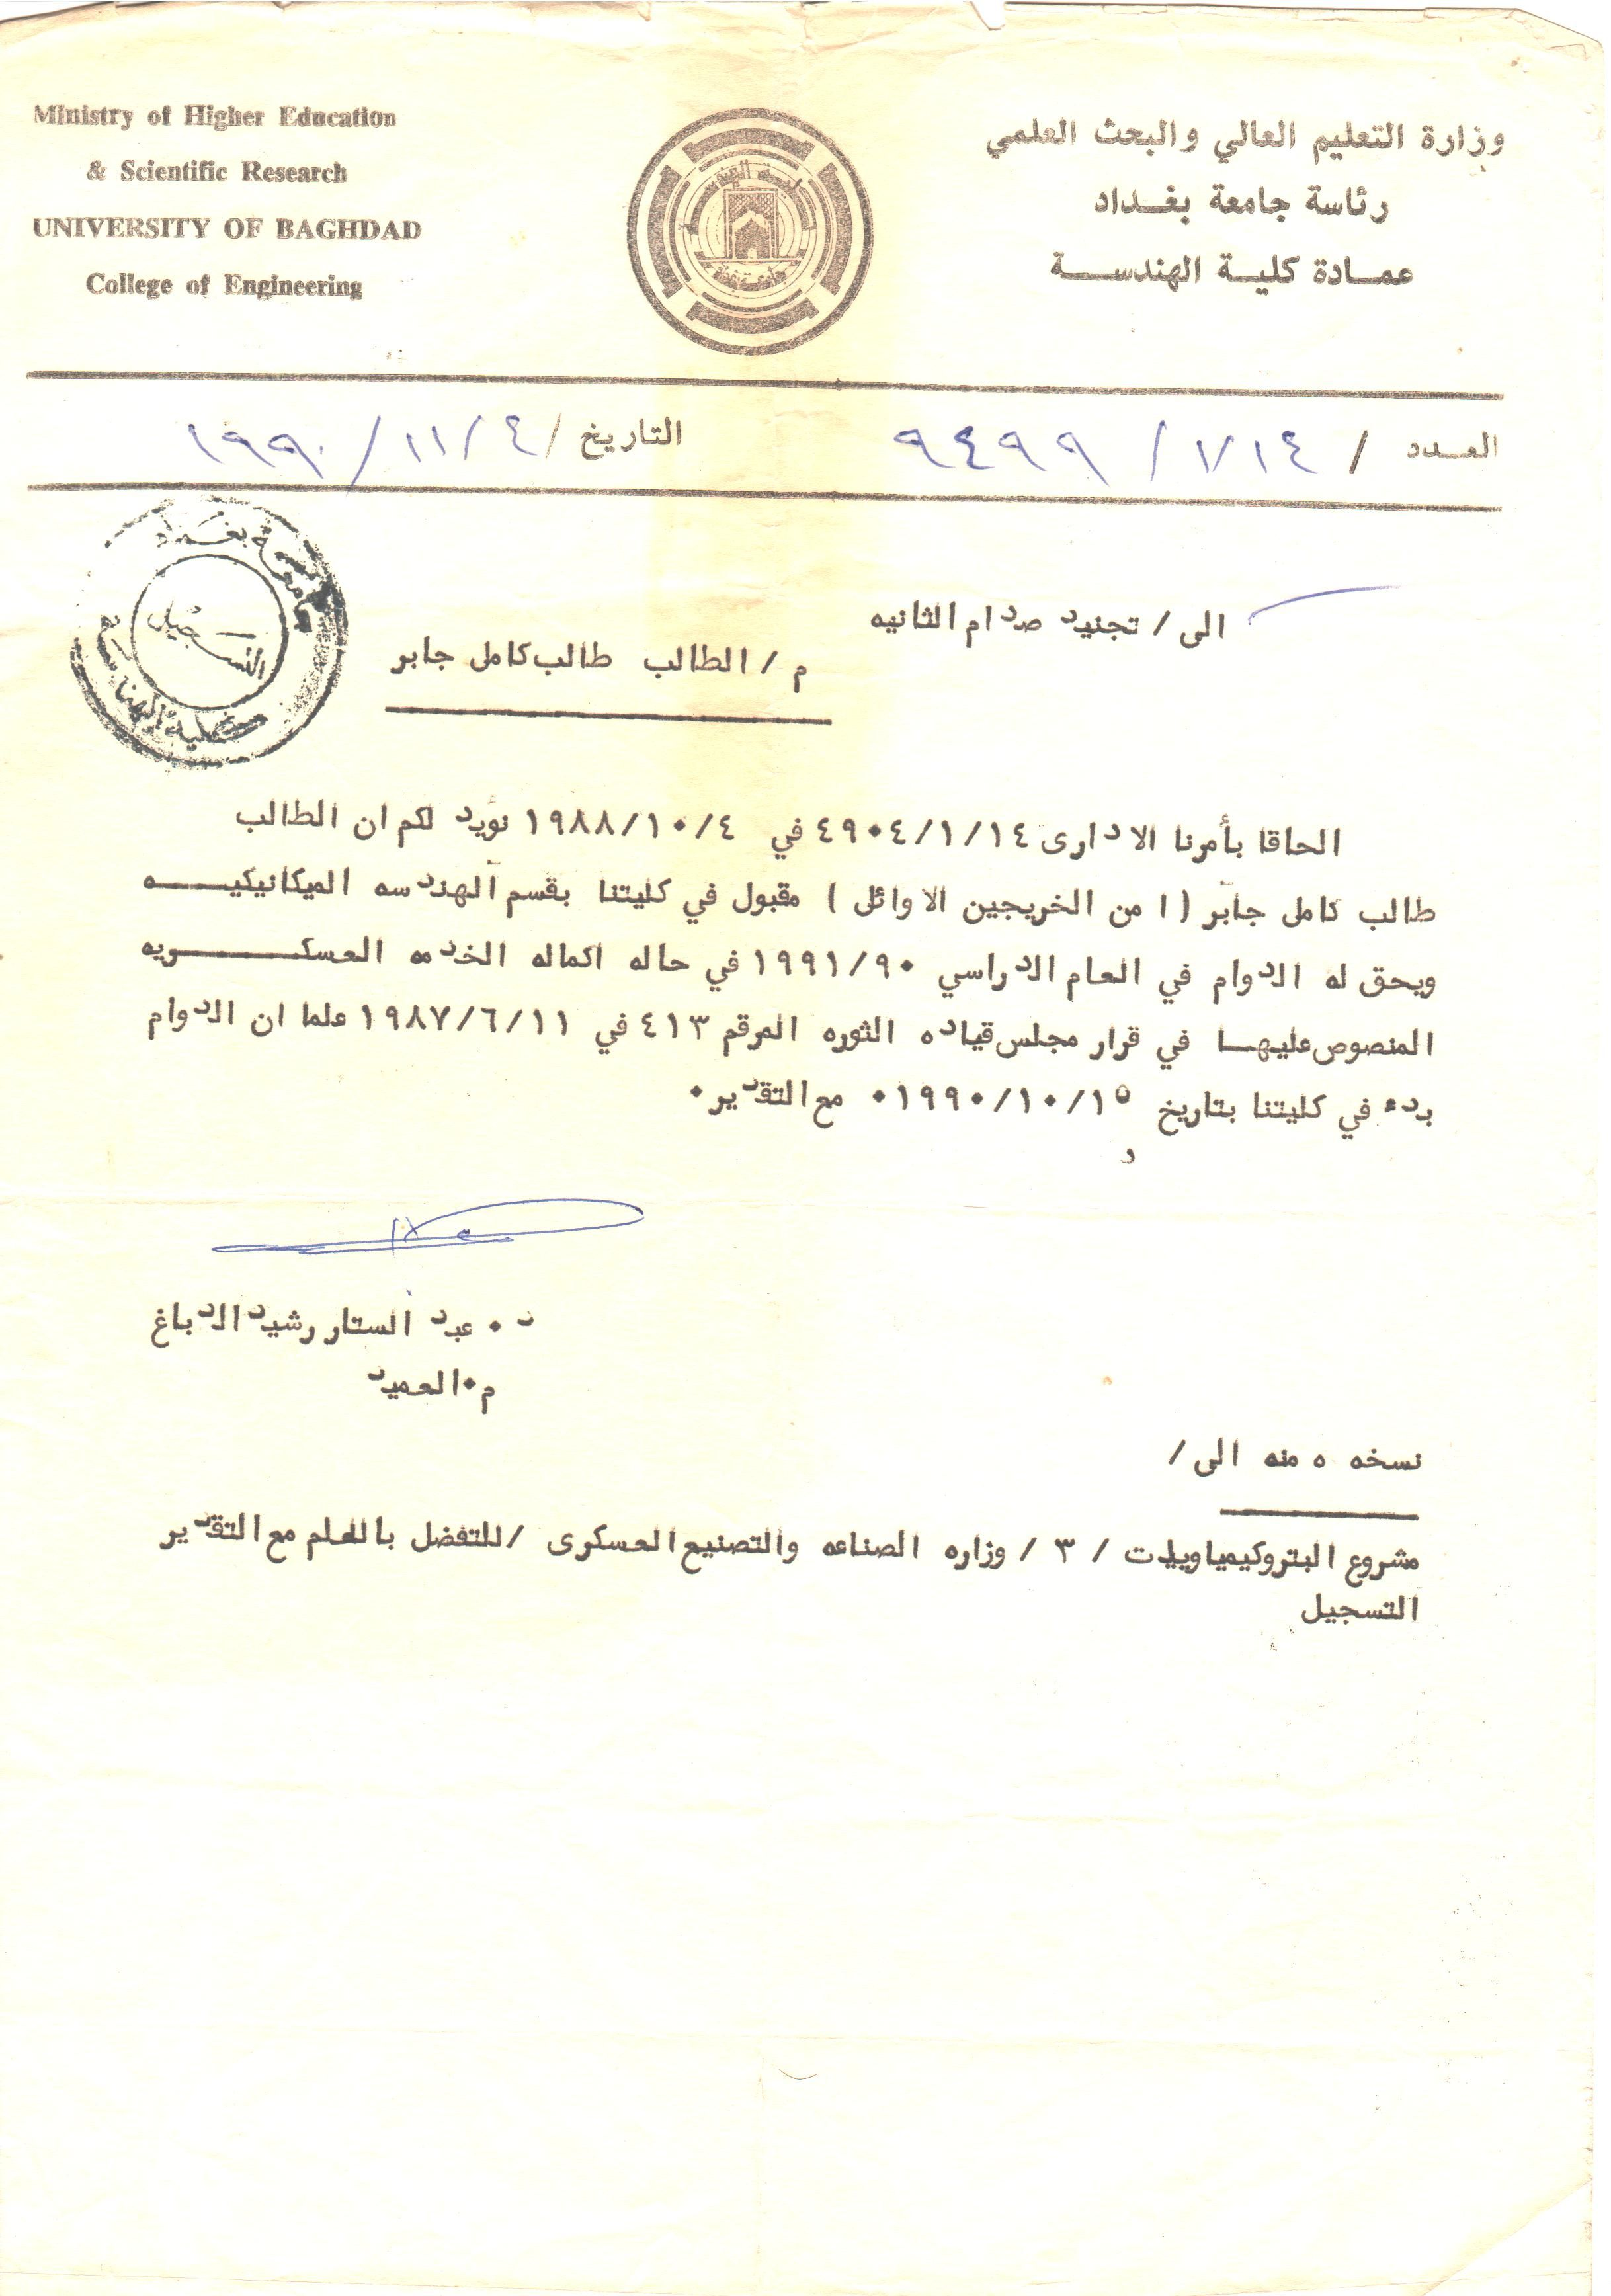 Pin By سيد طالب العلوي On اوراق عراقية College University Sheet Music